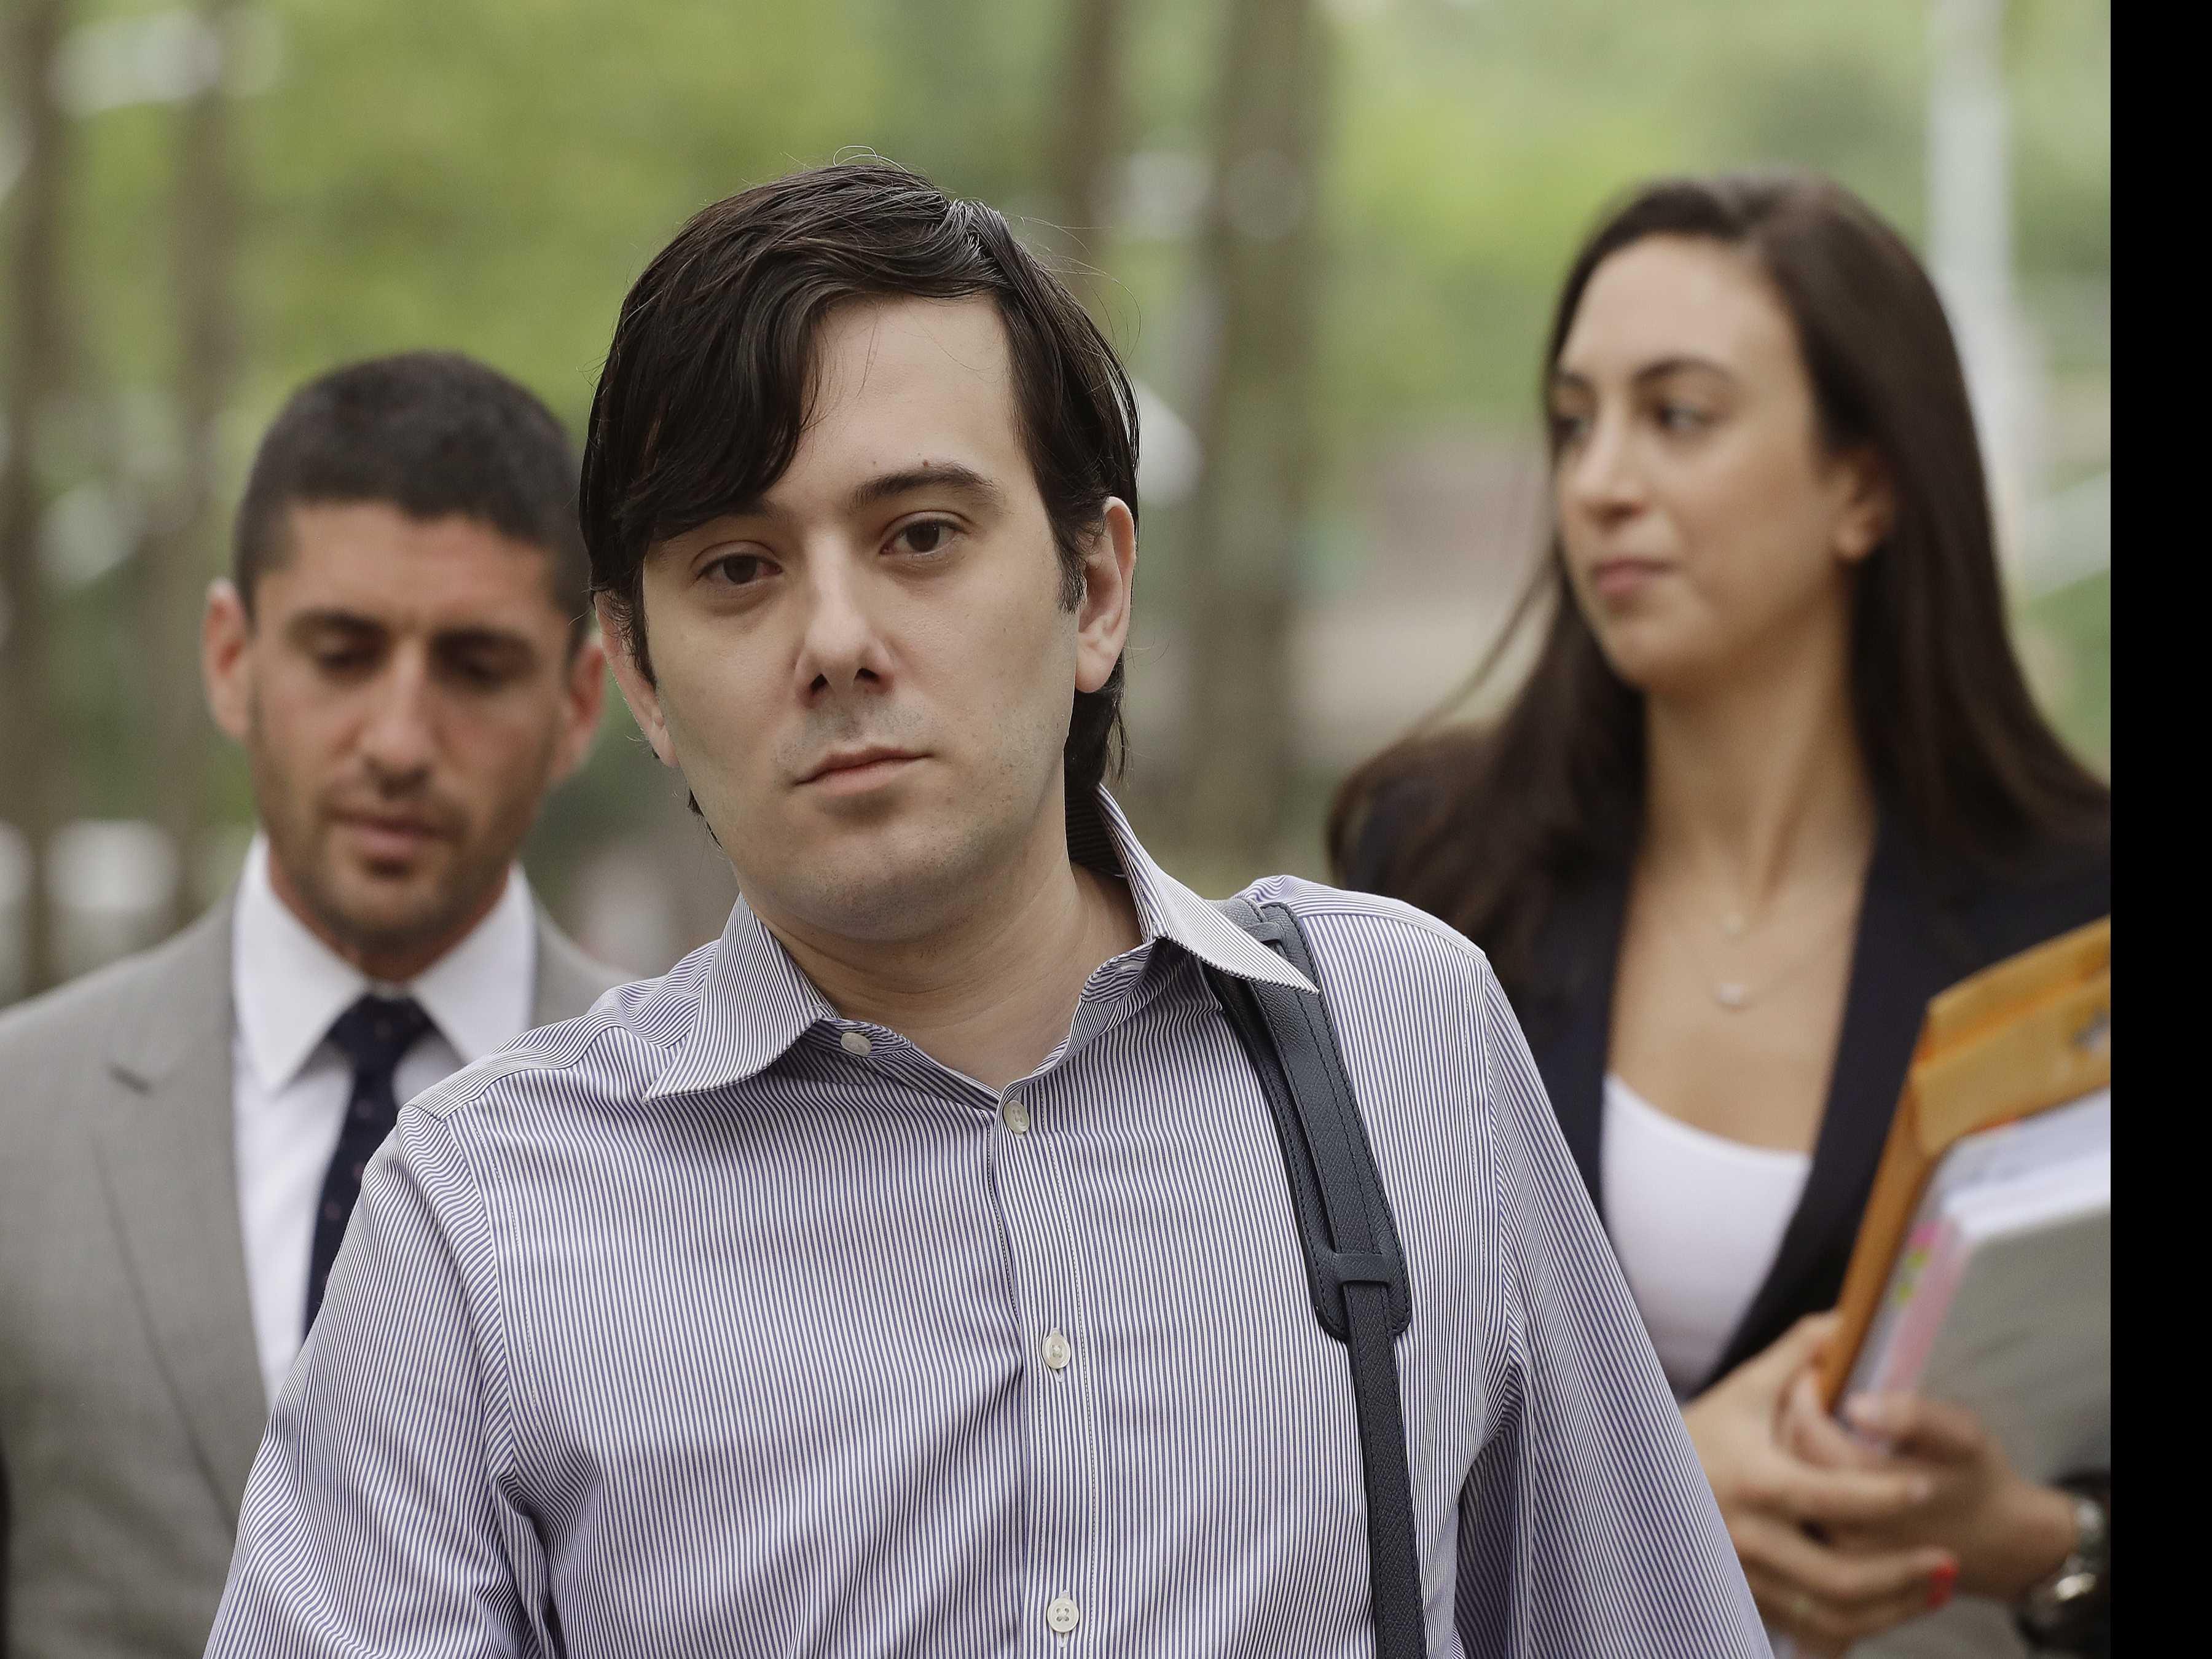 'Pharma Bro' Defies Advice to Keep Quiet Before Fraud Trial